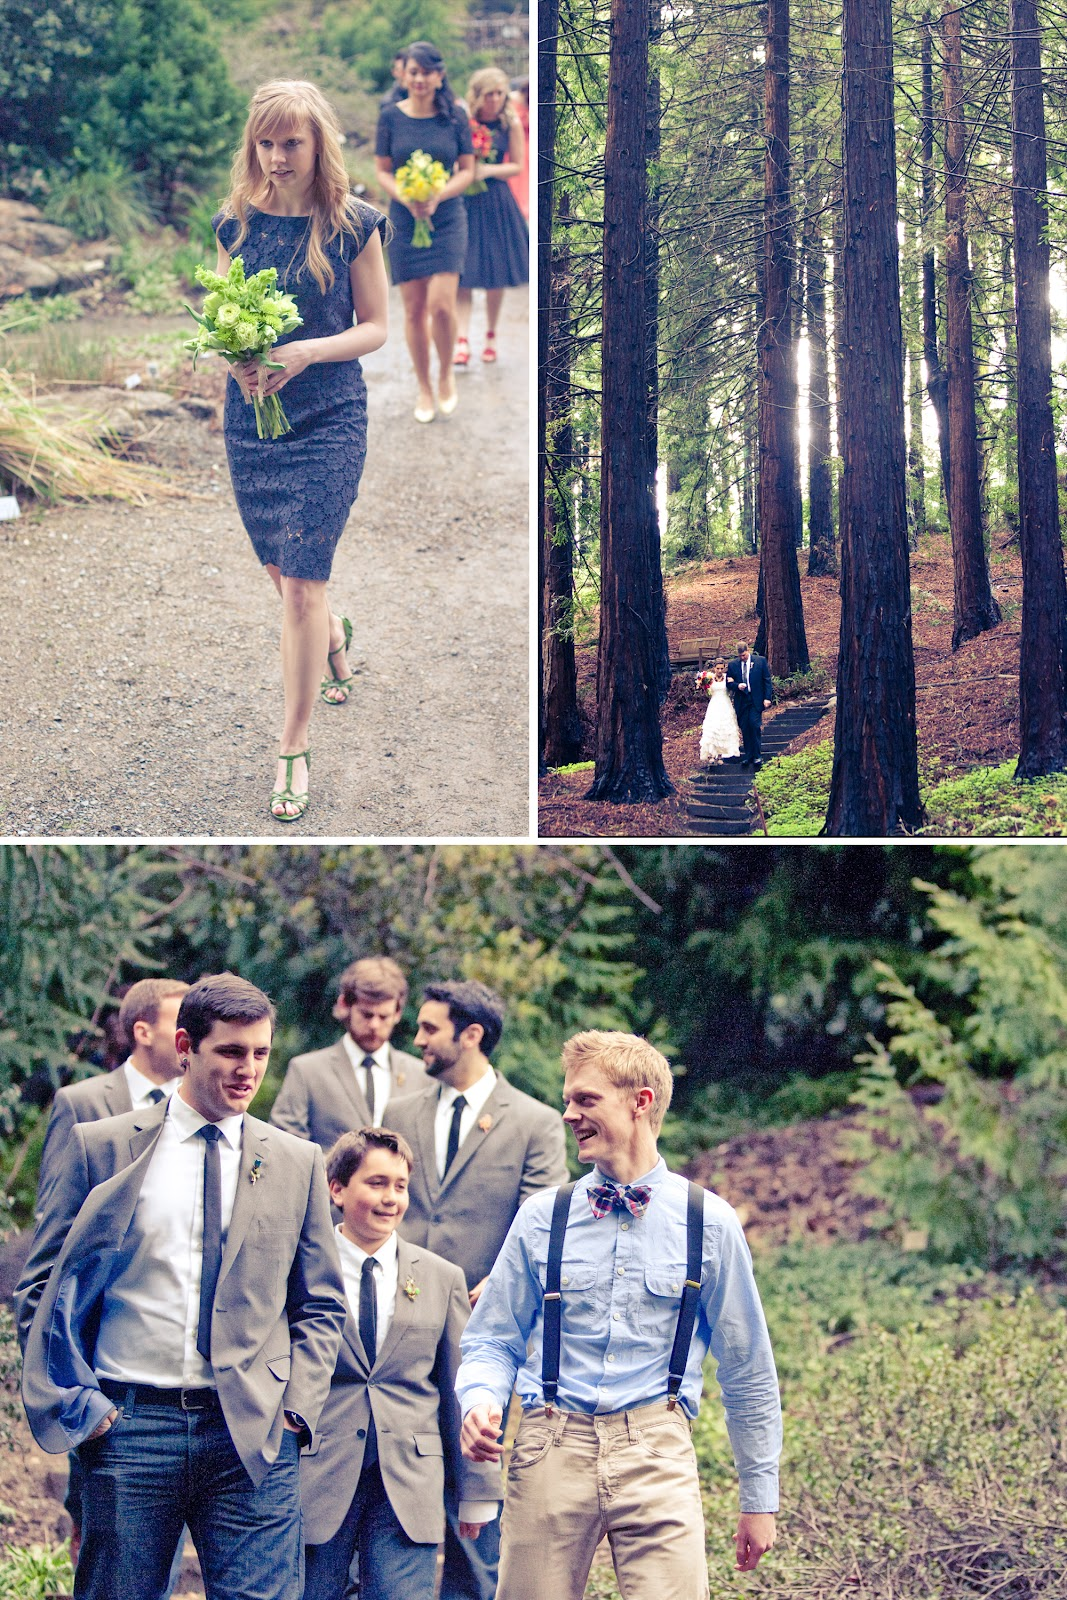 Berkeley, Bontanical Gardens, Mather Redwood Grove, OneLove Photography